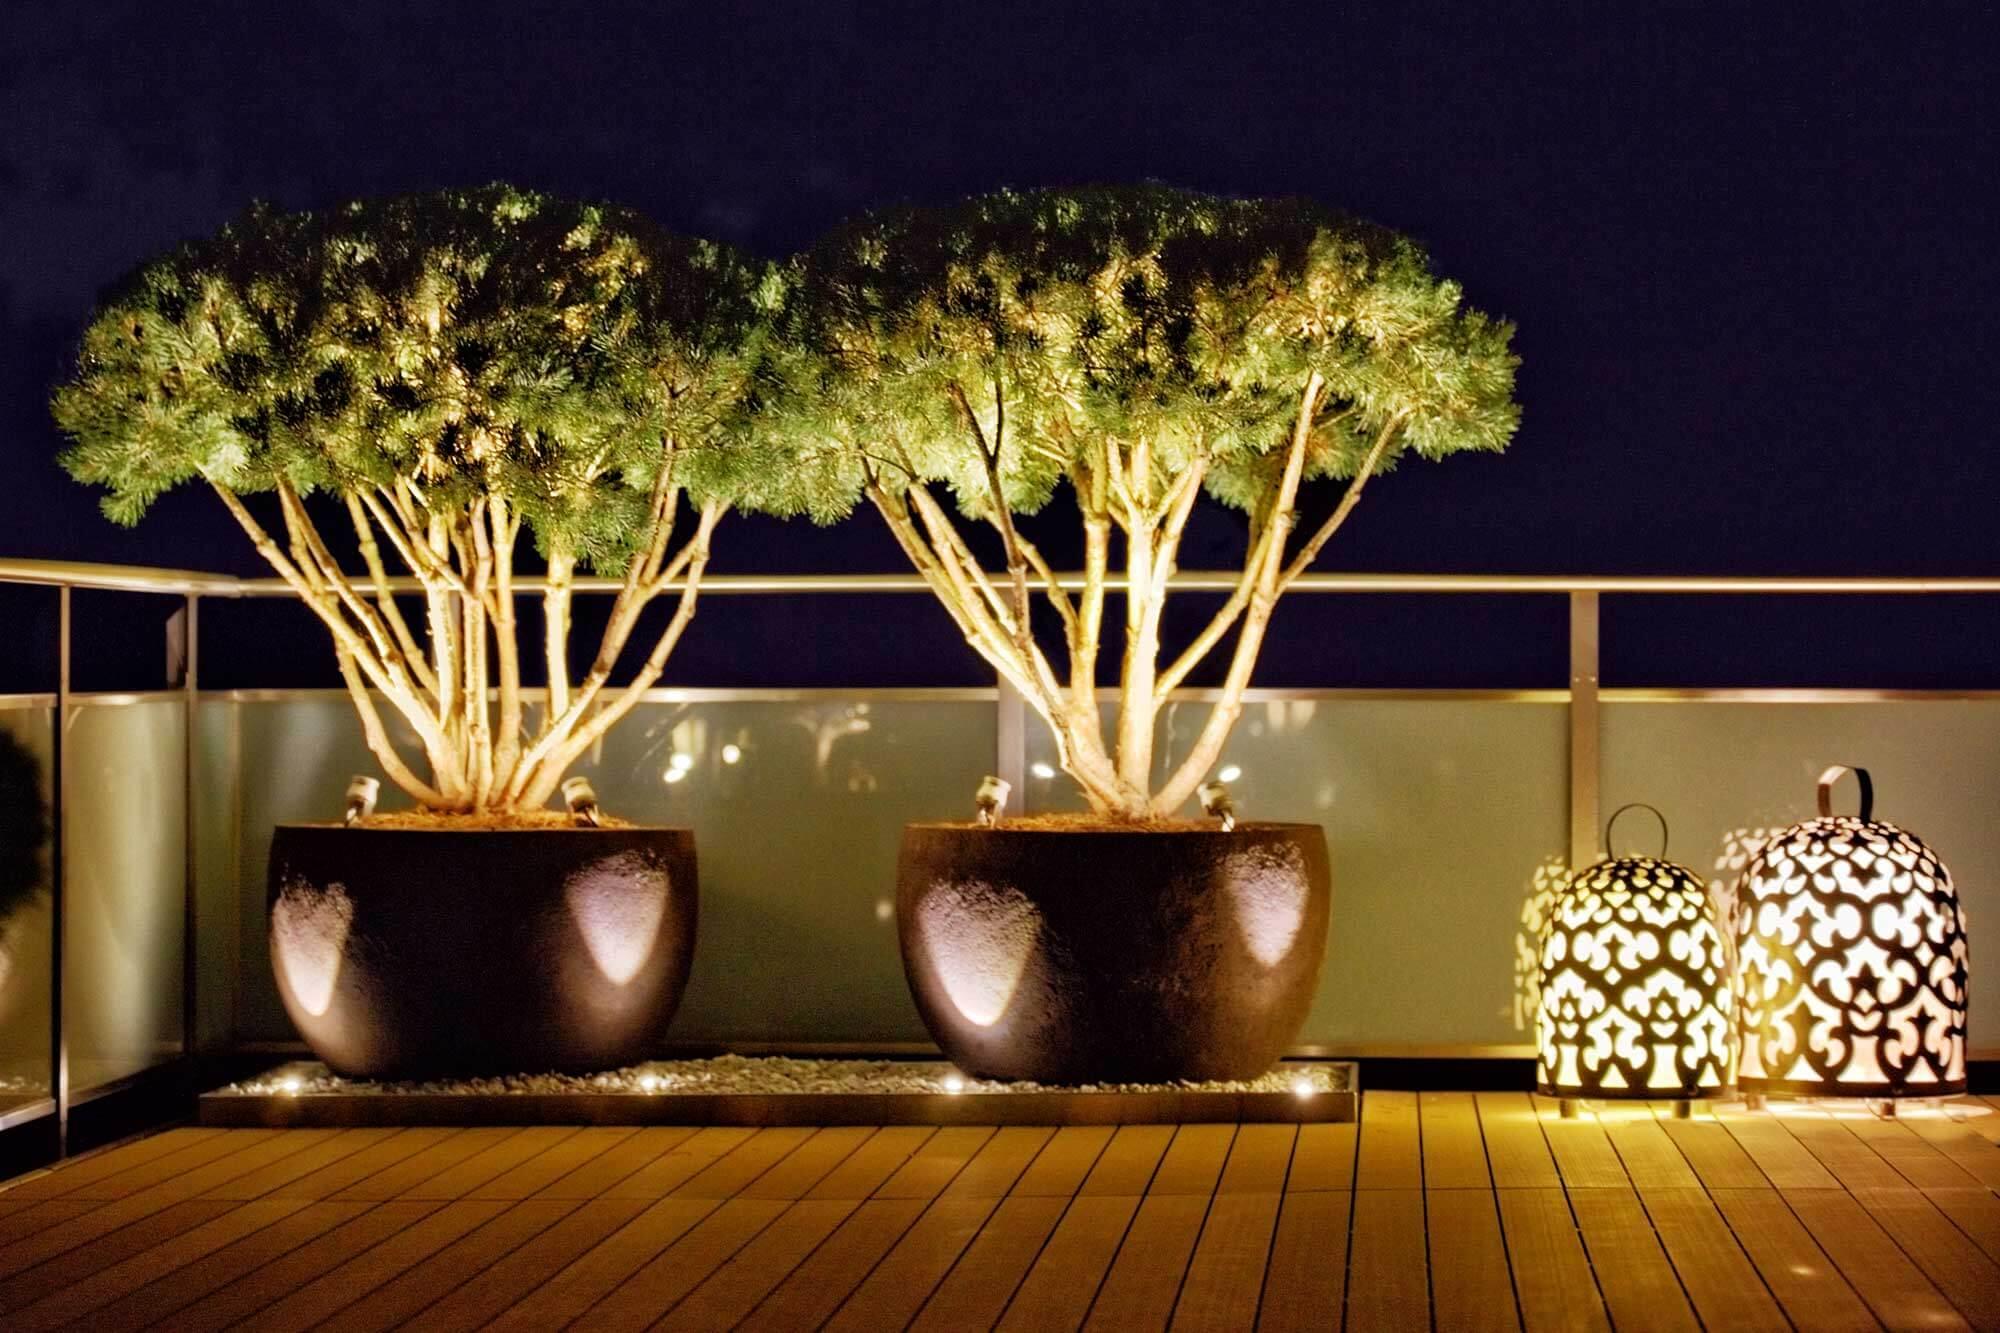 terrasse-zuercher-oberland-parcs-gartengestaltung-8